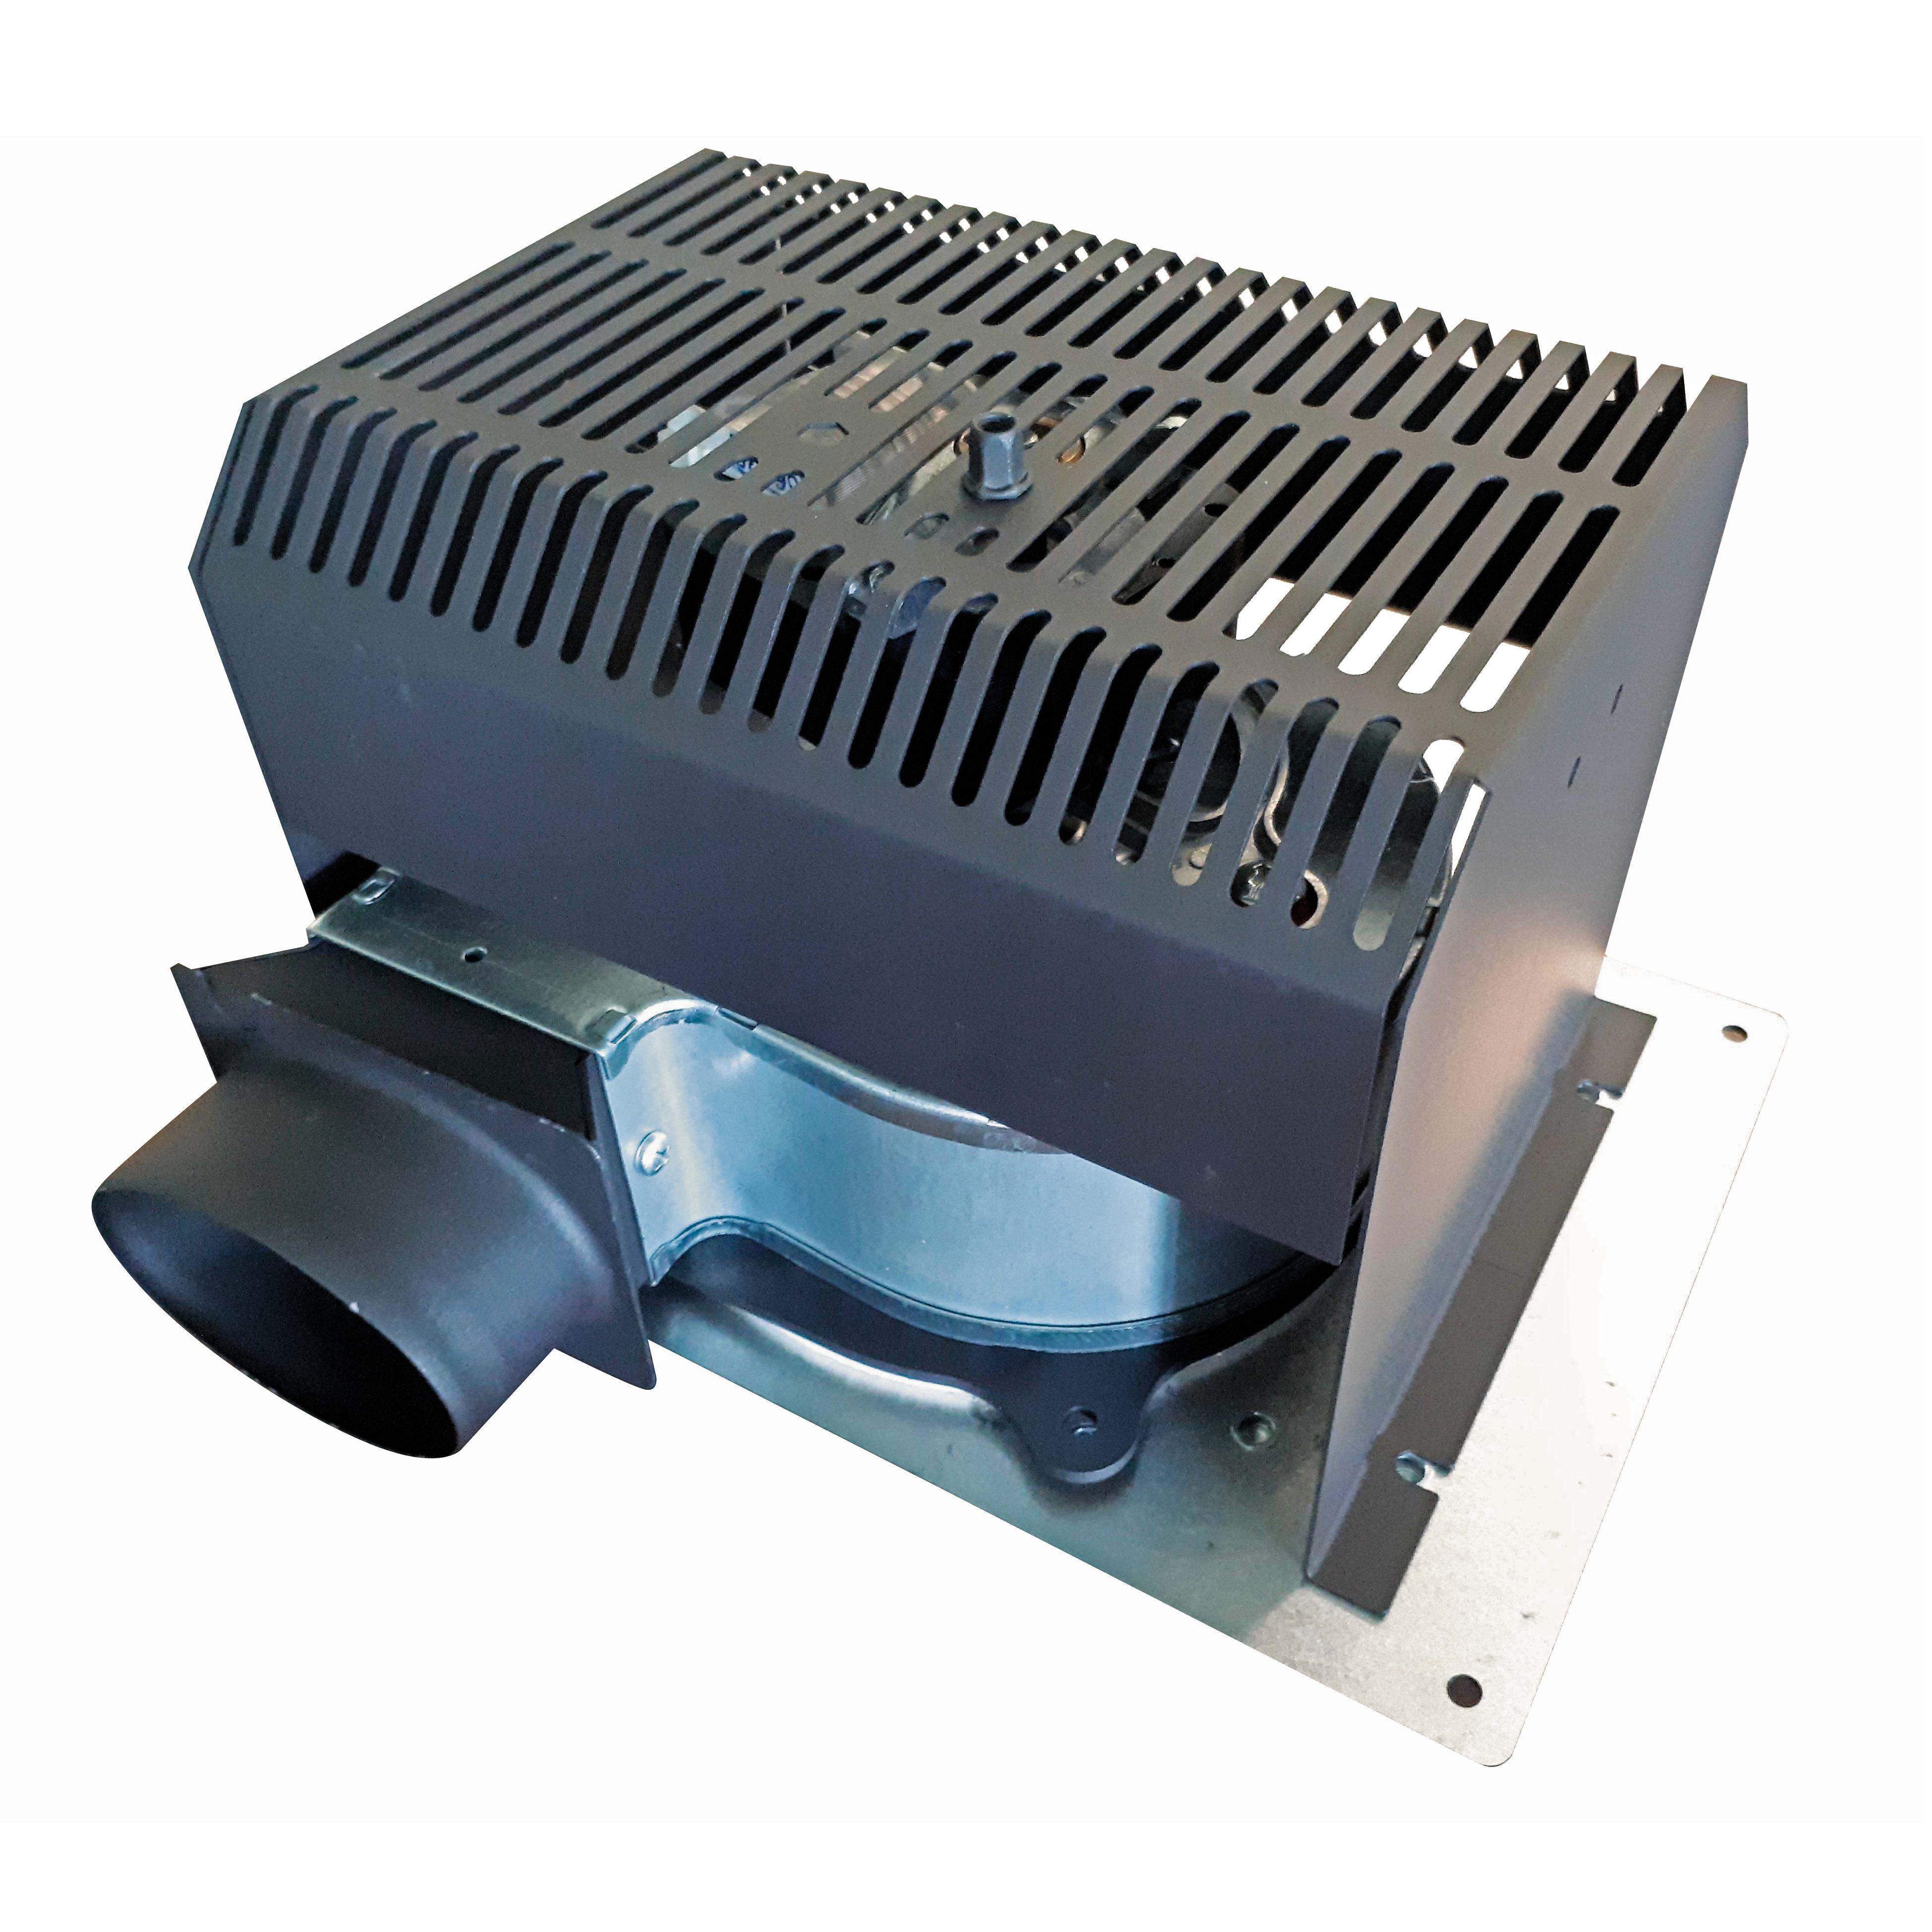 Tubi Per Canalizzare Una Stufa A Pellet kit di distribuzione di aria calda per stufa a pellet superior